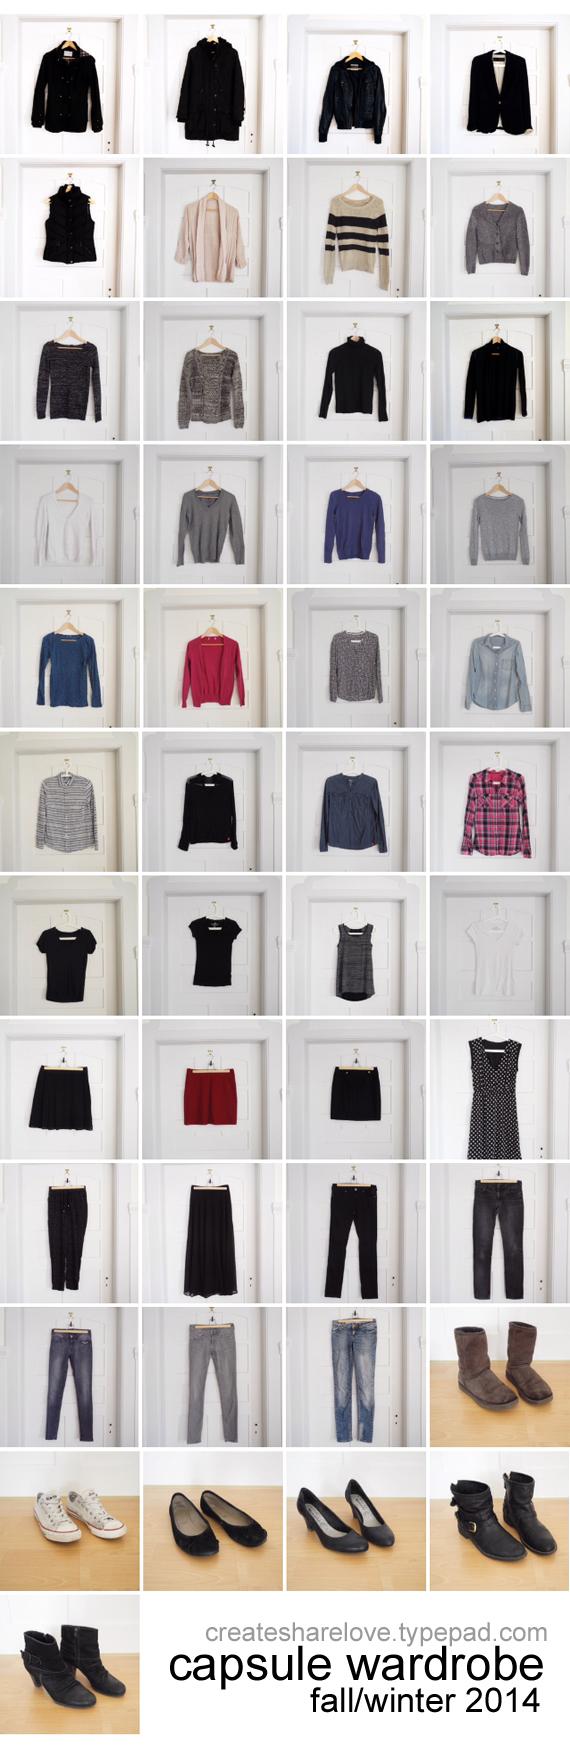 Create Share Love | Capsule Wardrobe Fall-Winter 2014